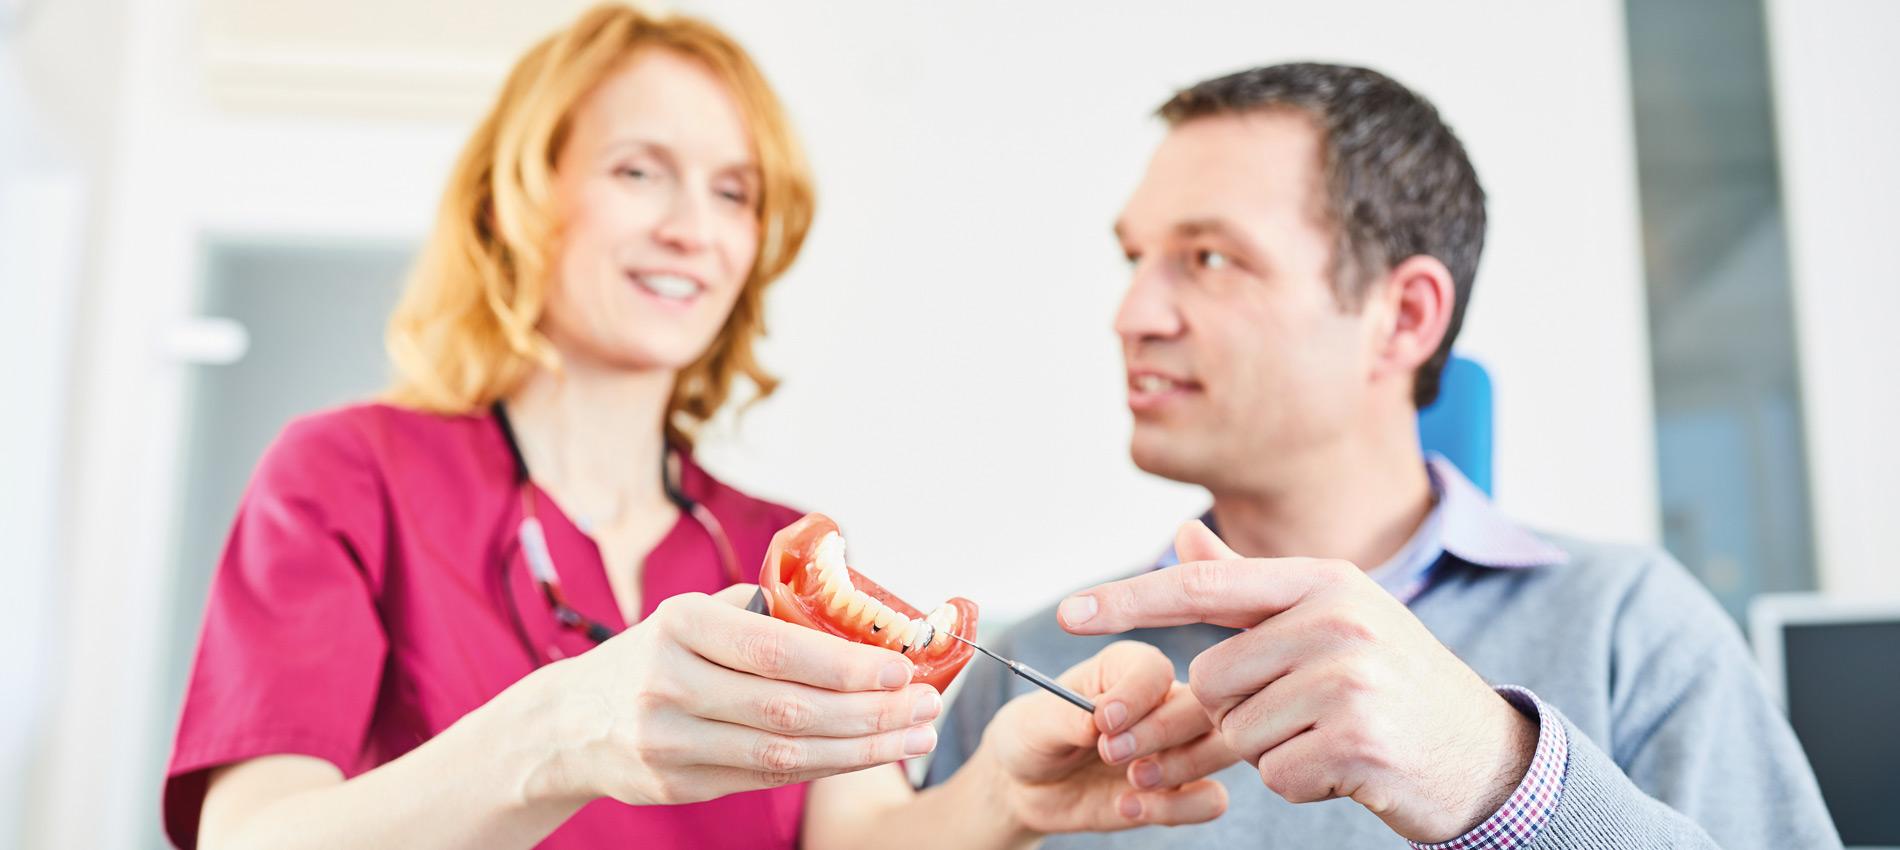 Zahnarztpraxis Dr. Christiane Langrock - Mundschleimhautveränderungen 1